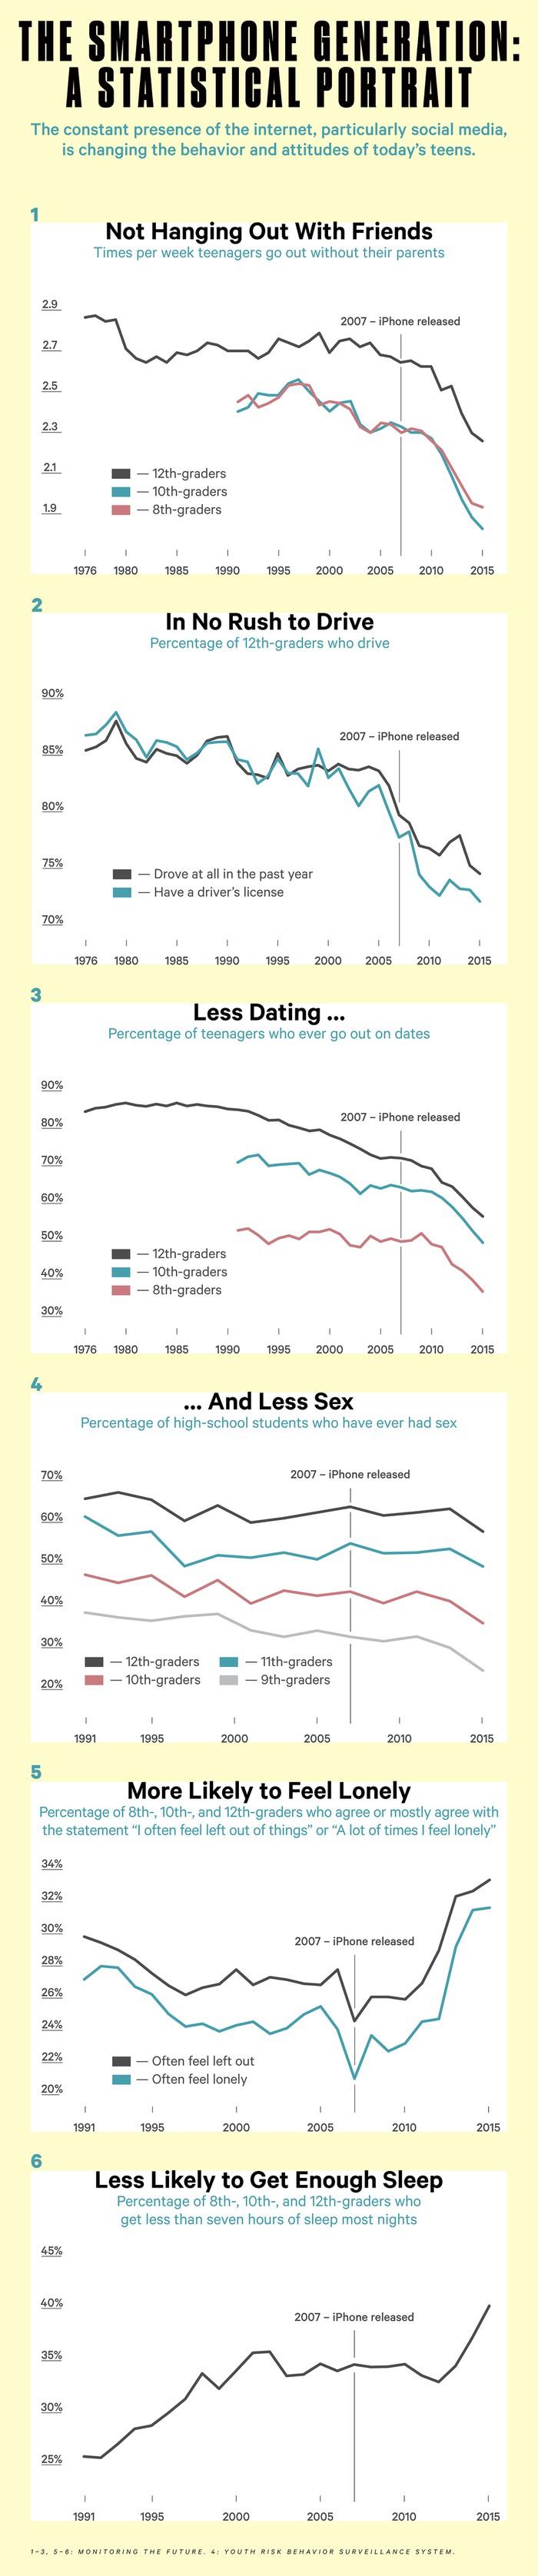 iGen: an Analysis of Generation Z